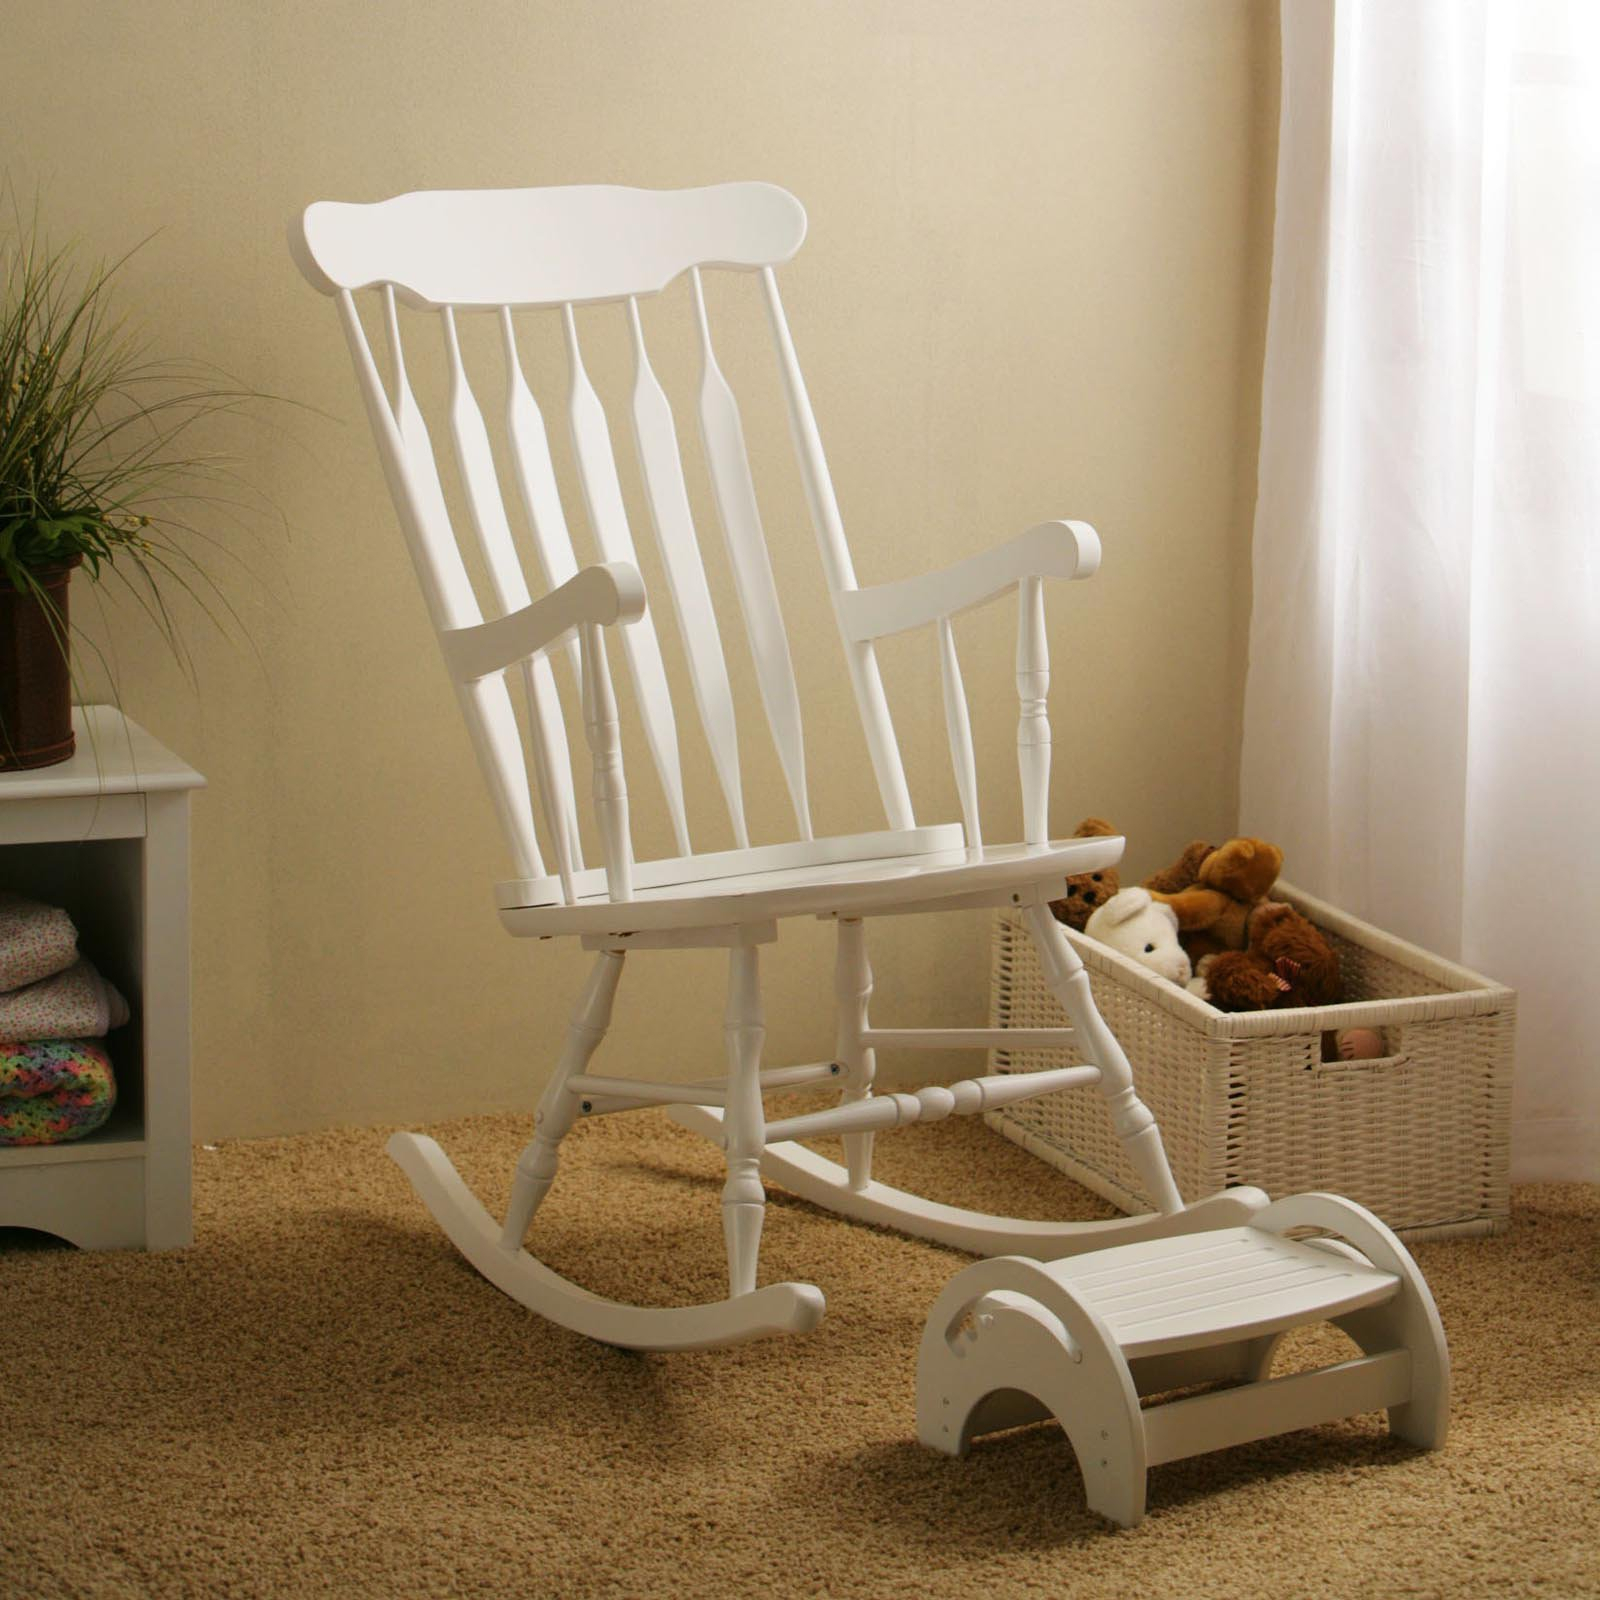 Nursing Rocking Chair   Bangkokfoodietour For Wooden Baby Nursery Rocking Chairs (View 5 of 20)